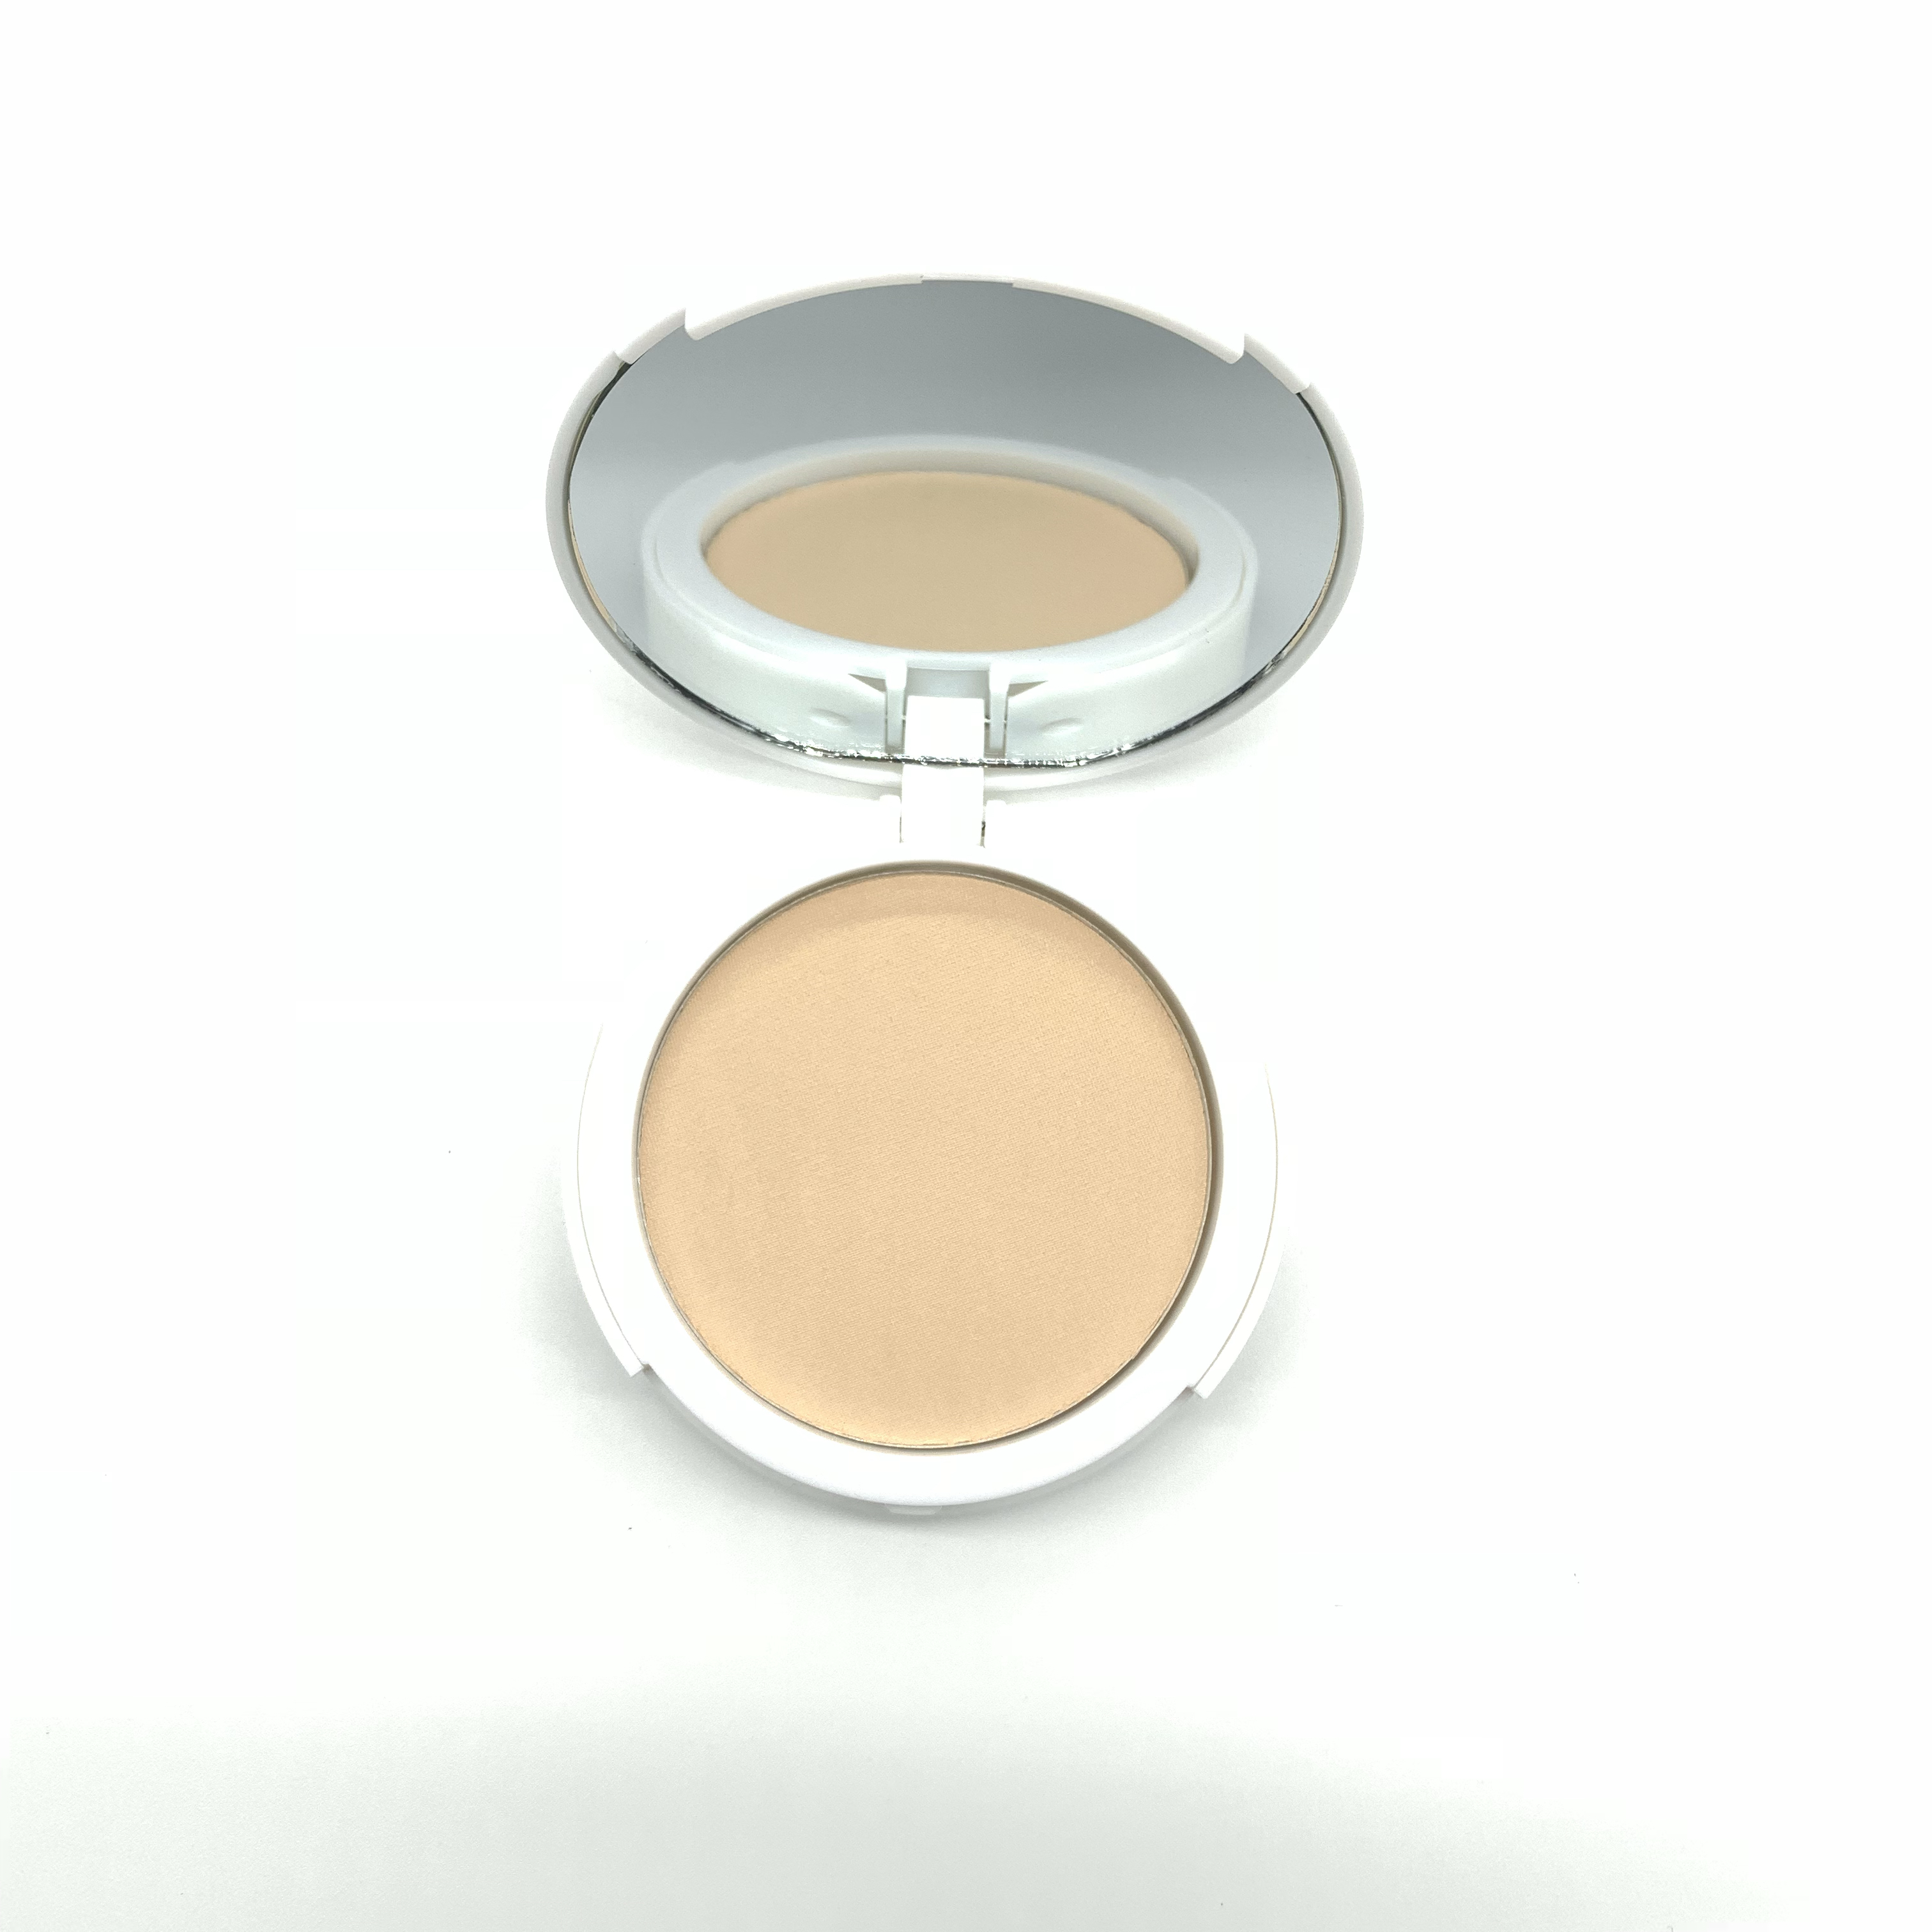 Natural Moisture Face Make Up เครื่องสำอางค์เดี่ยวสีผง (Pressed Powder